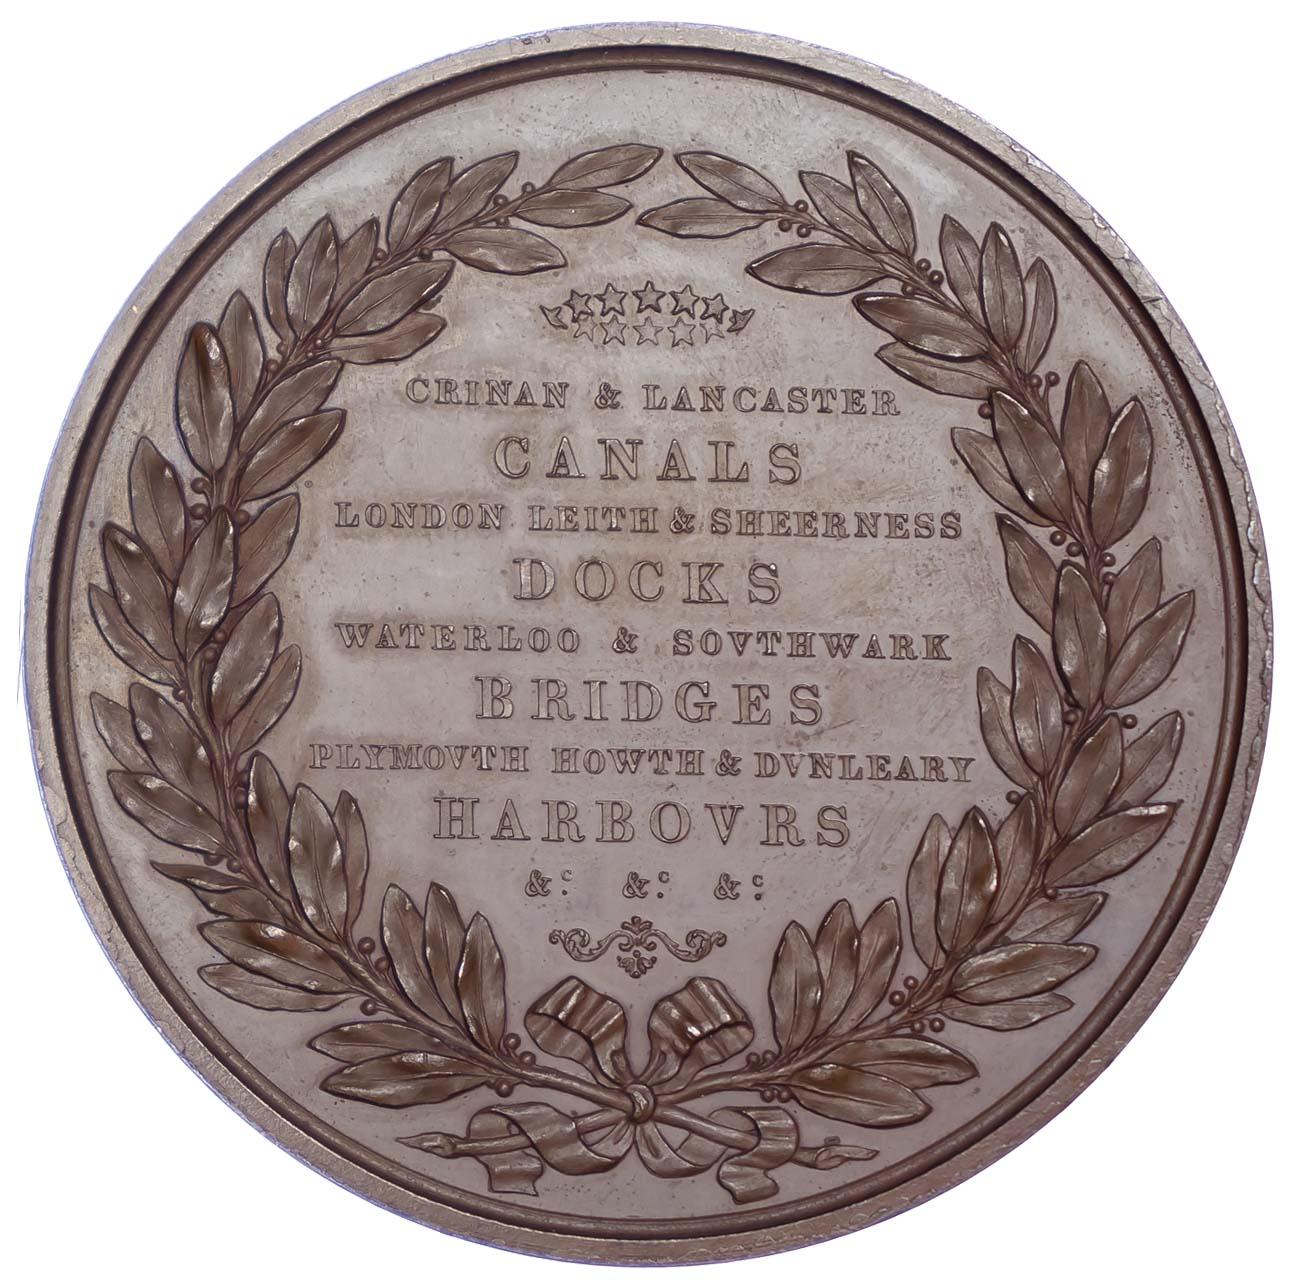 George IV, Death of John Rennie 1821, Copper medal